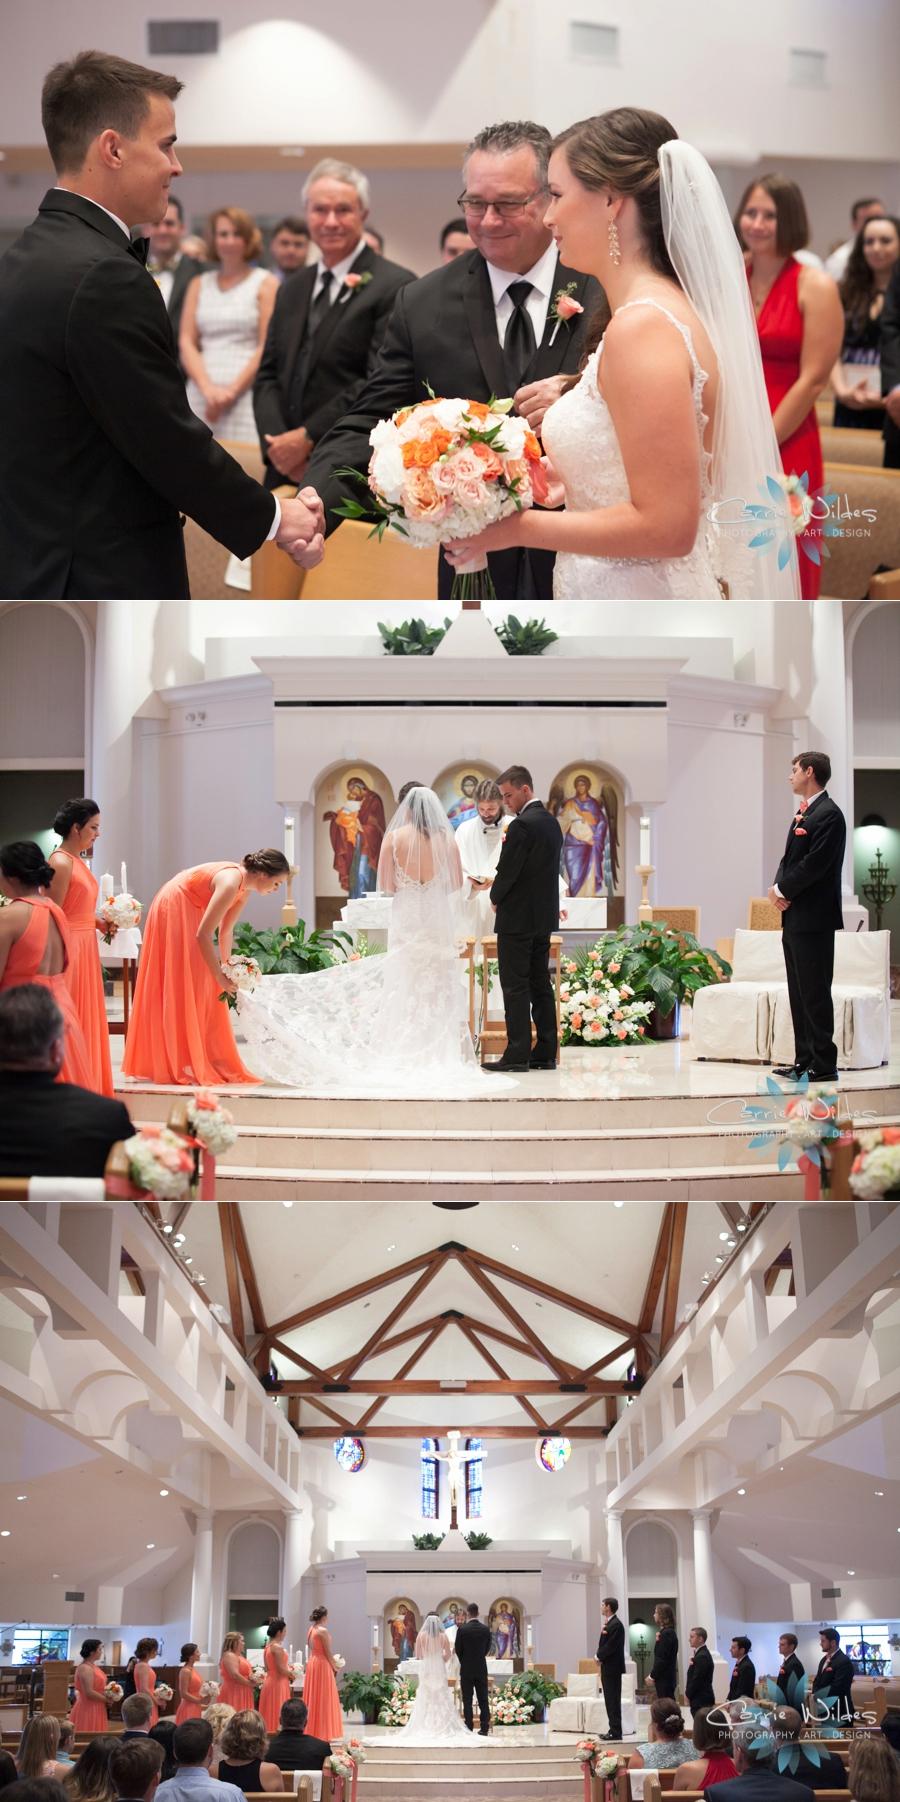 9_17_16 Jessica Marc Renaissance Vinoy Wedding_0018.jpg